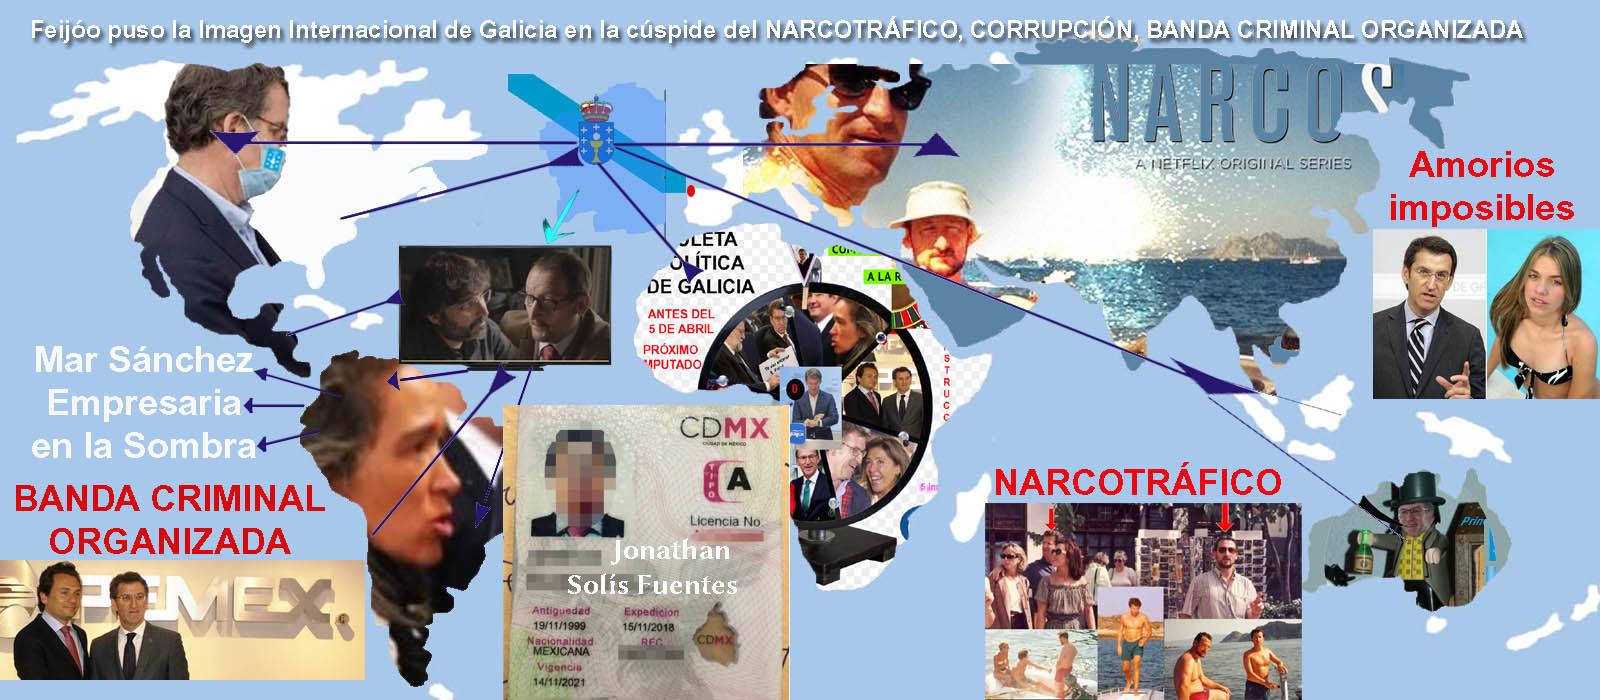 Xornal Galicia participa de la extradicción de Lozoya a México ...